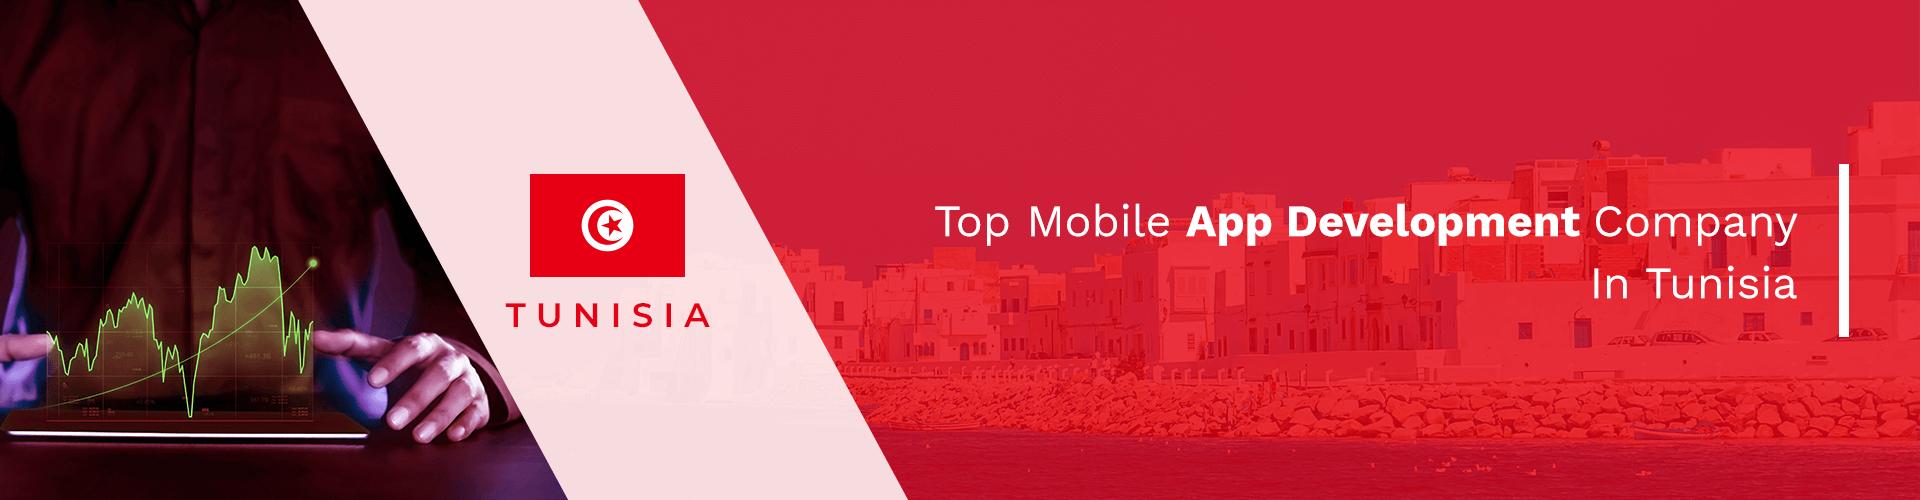 mobile app development tunisia